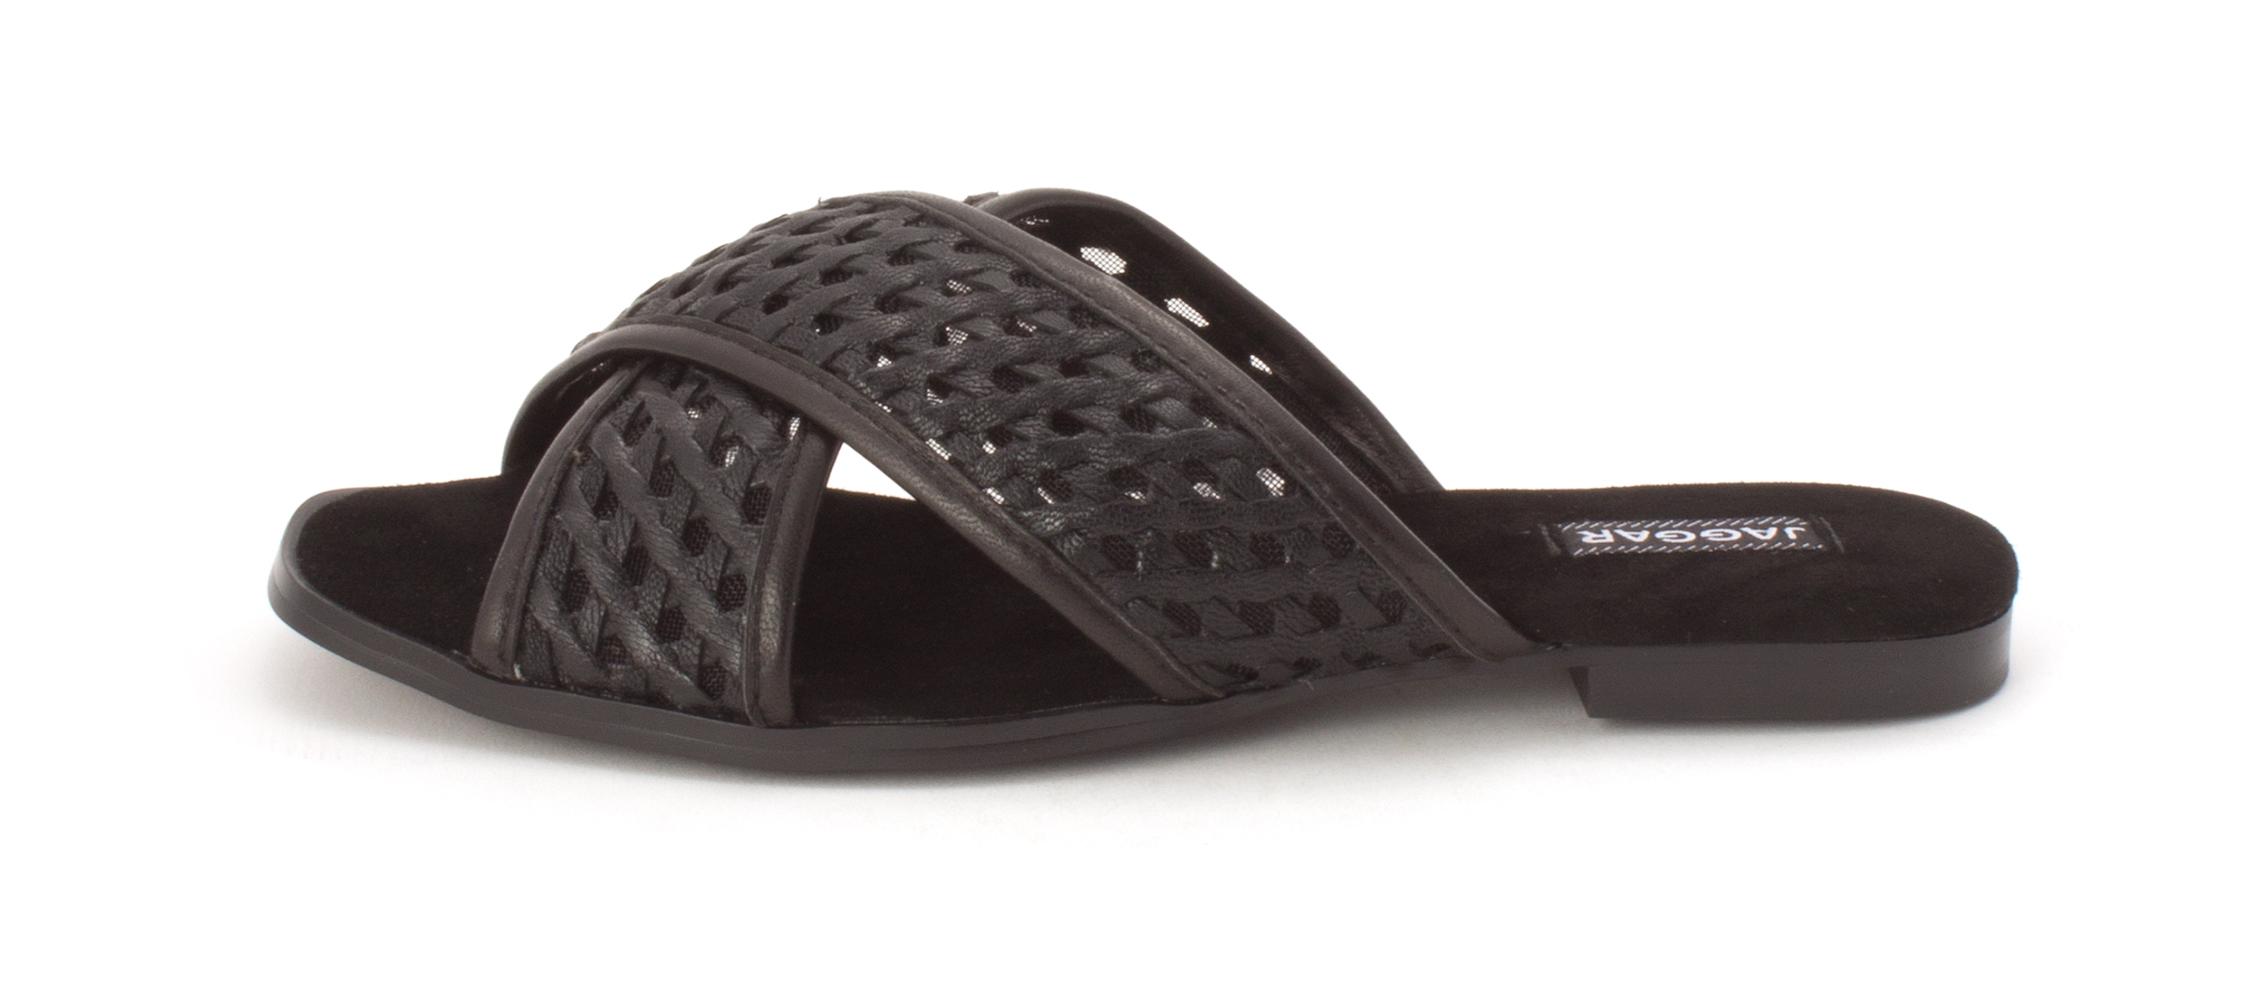 6e9ba5745 JAGGAR Womens Crossrd Flat Leather Open Toe Casual Slide Sandals